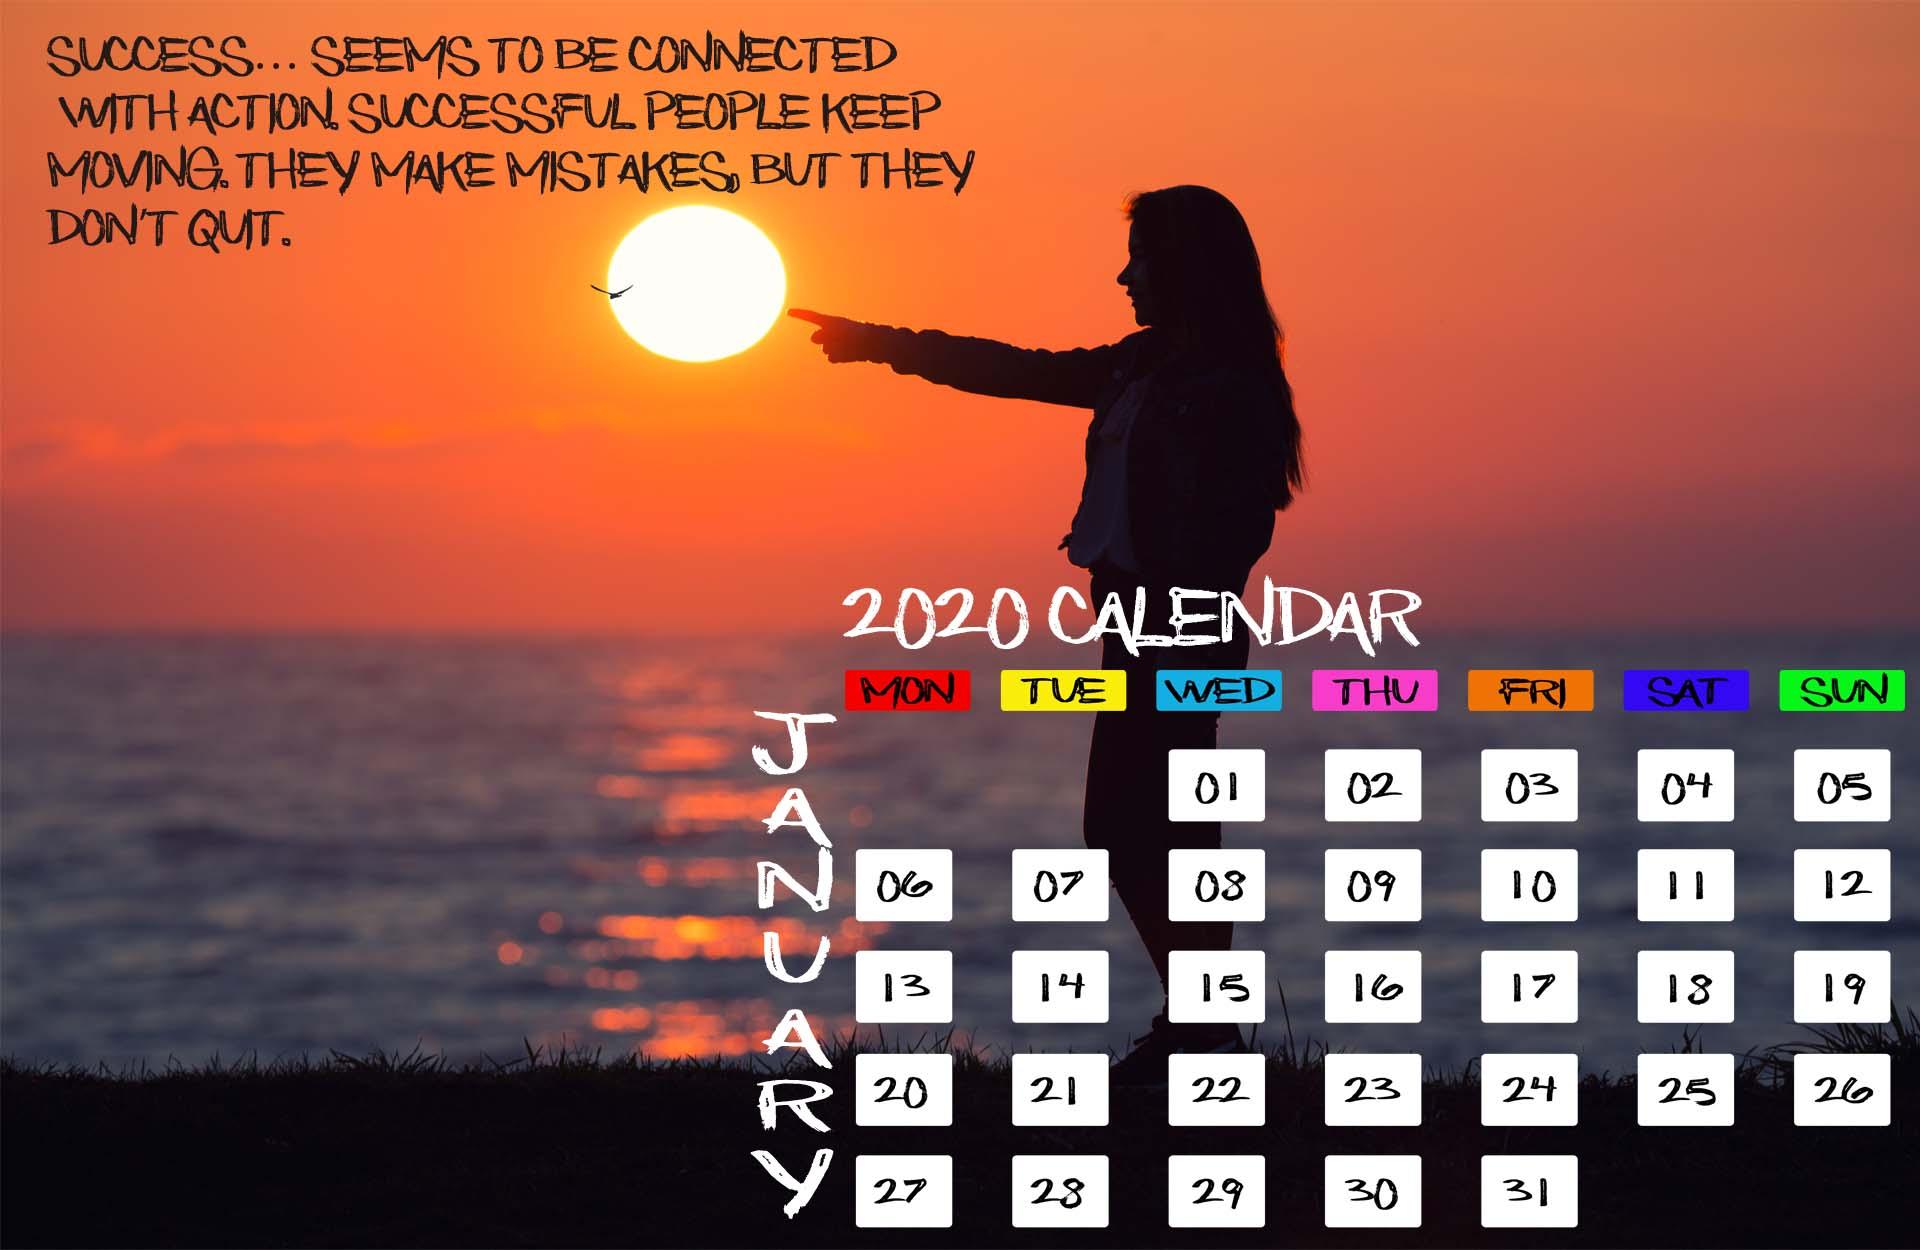 download January 2020 Calendar iPhone Desktop Mobile Tablet 1920x1250